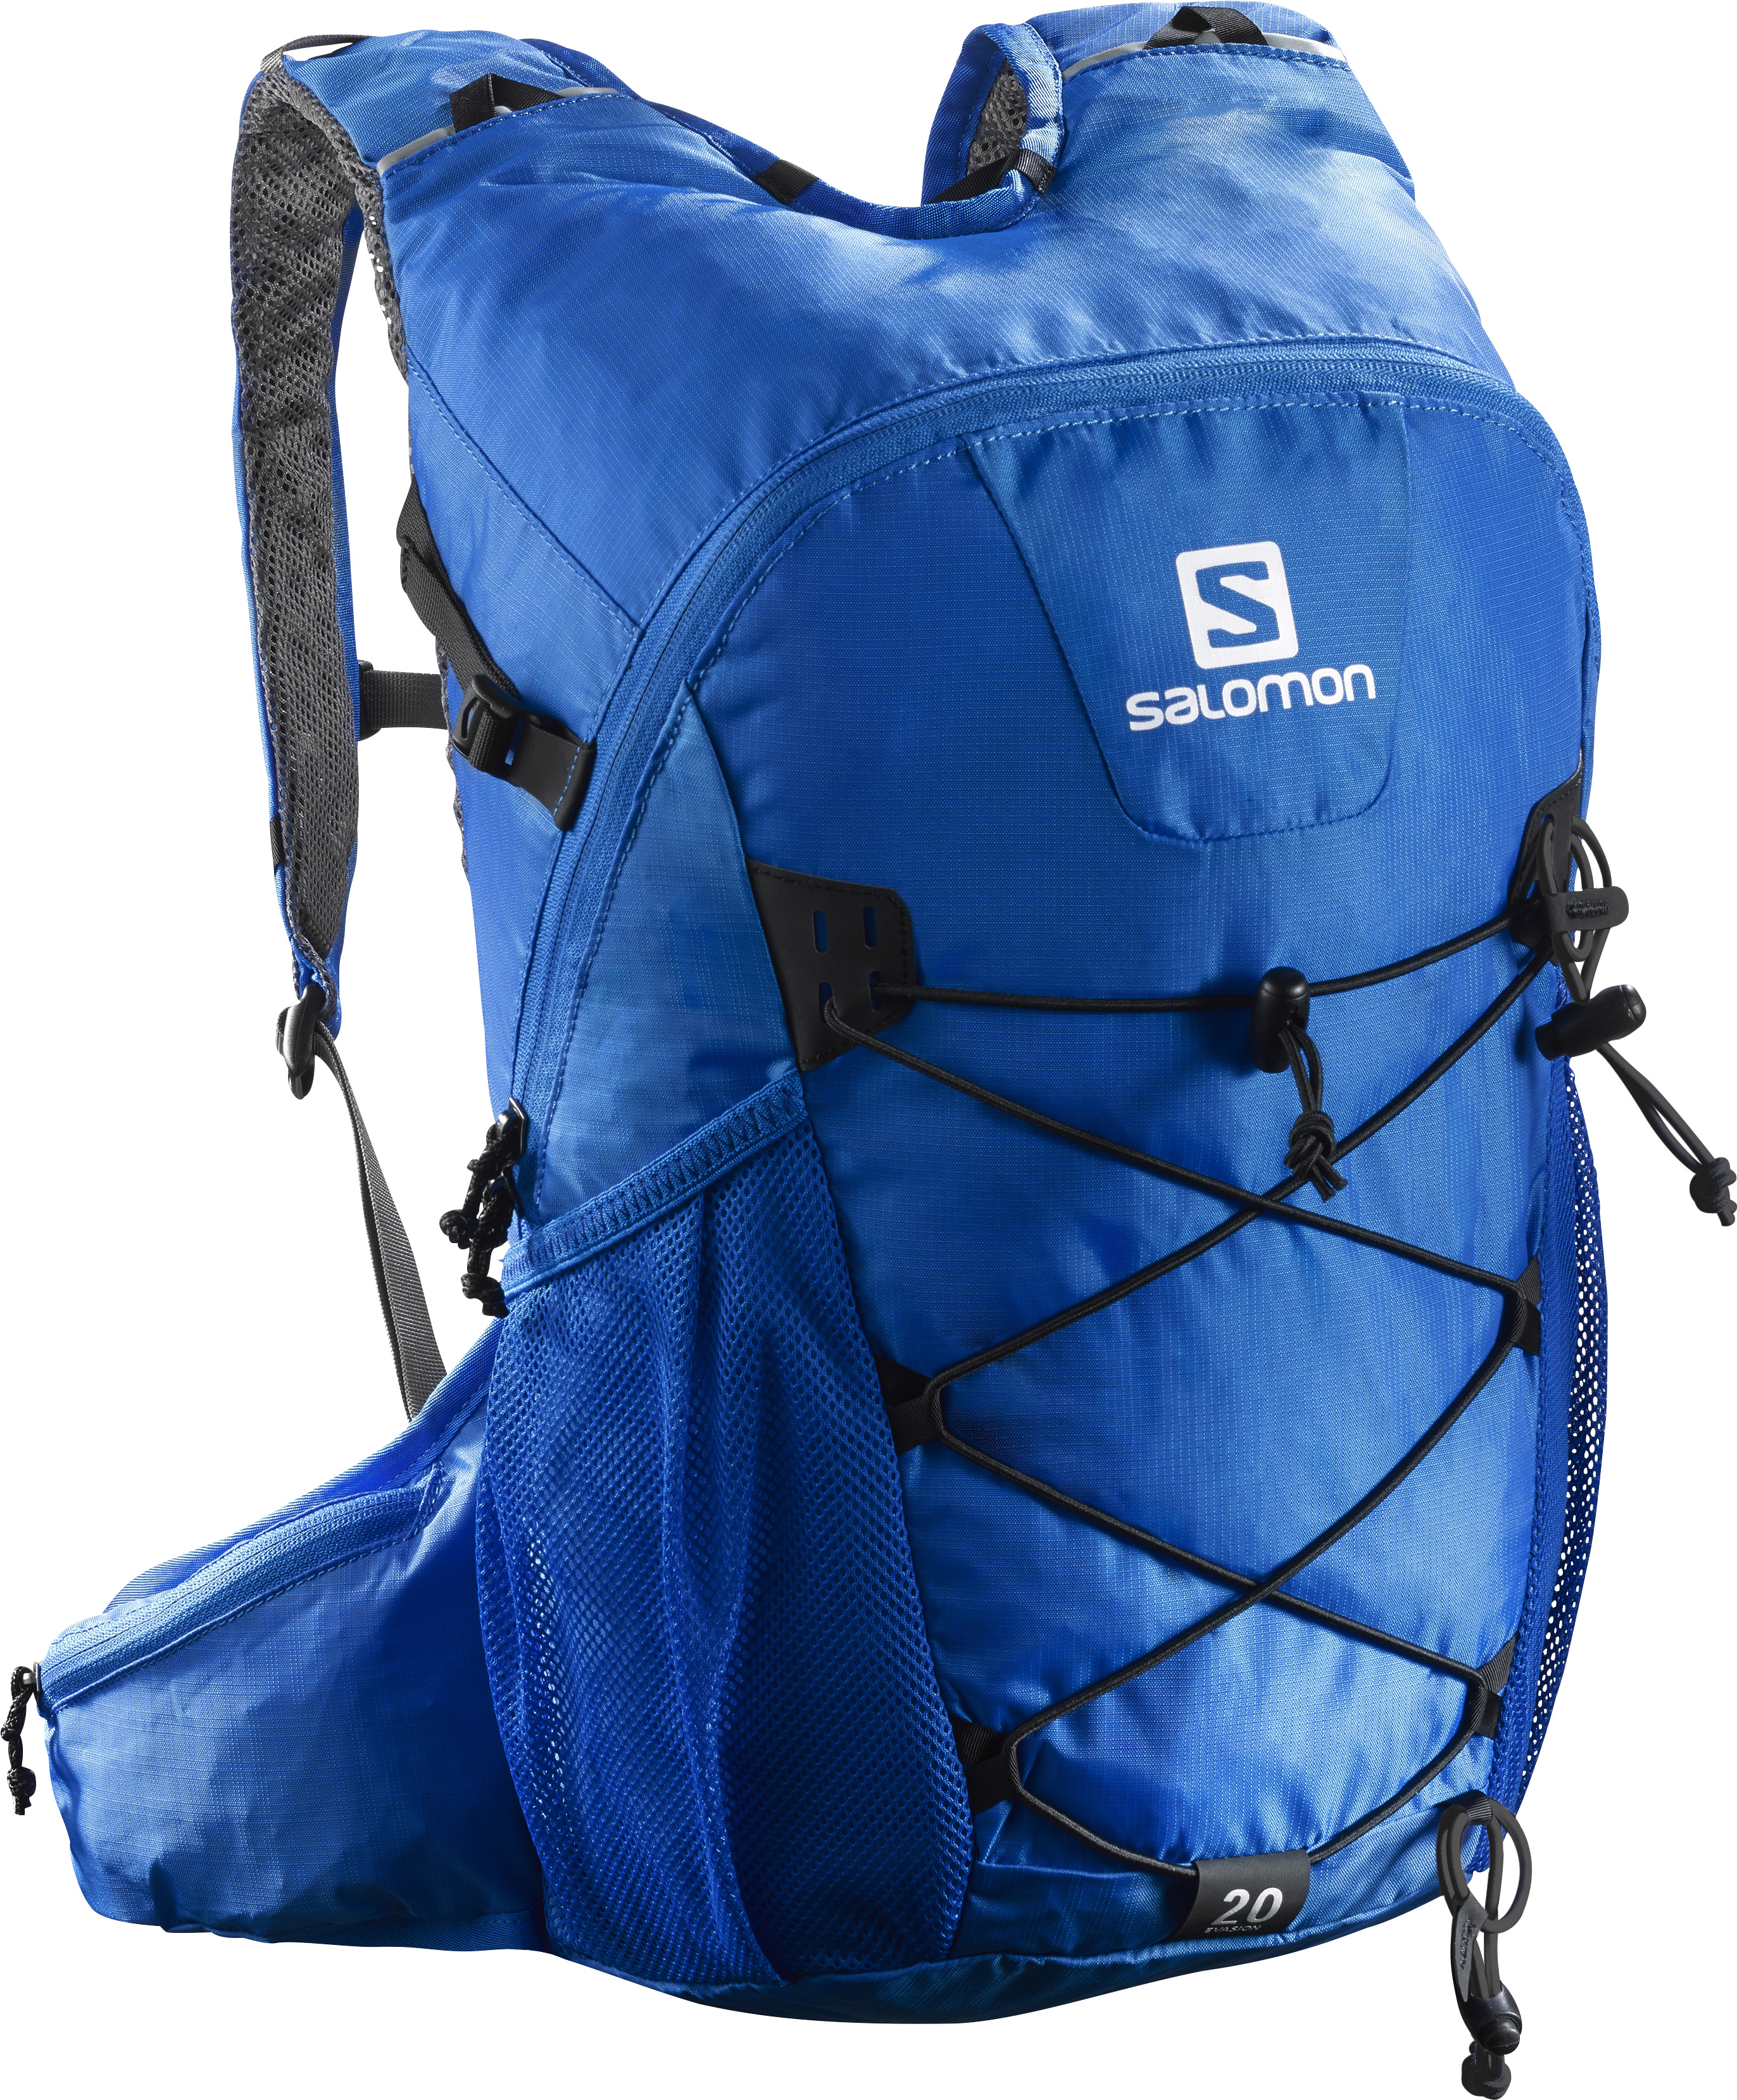 Salomon Evasion 20 Union Blue 382393 modrá